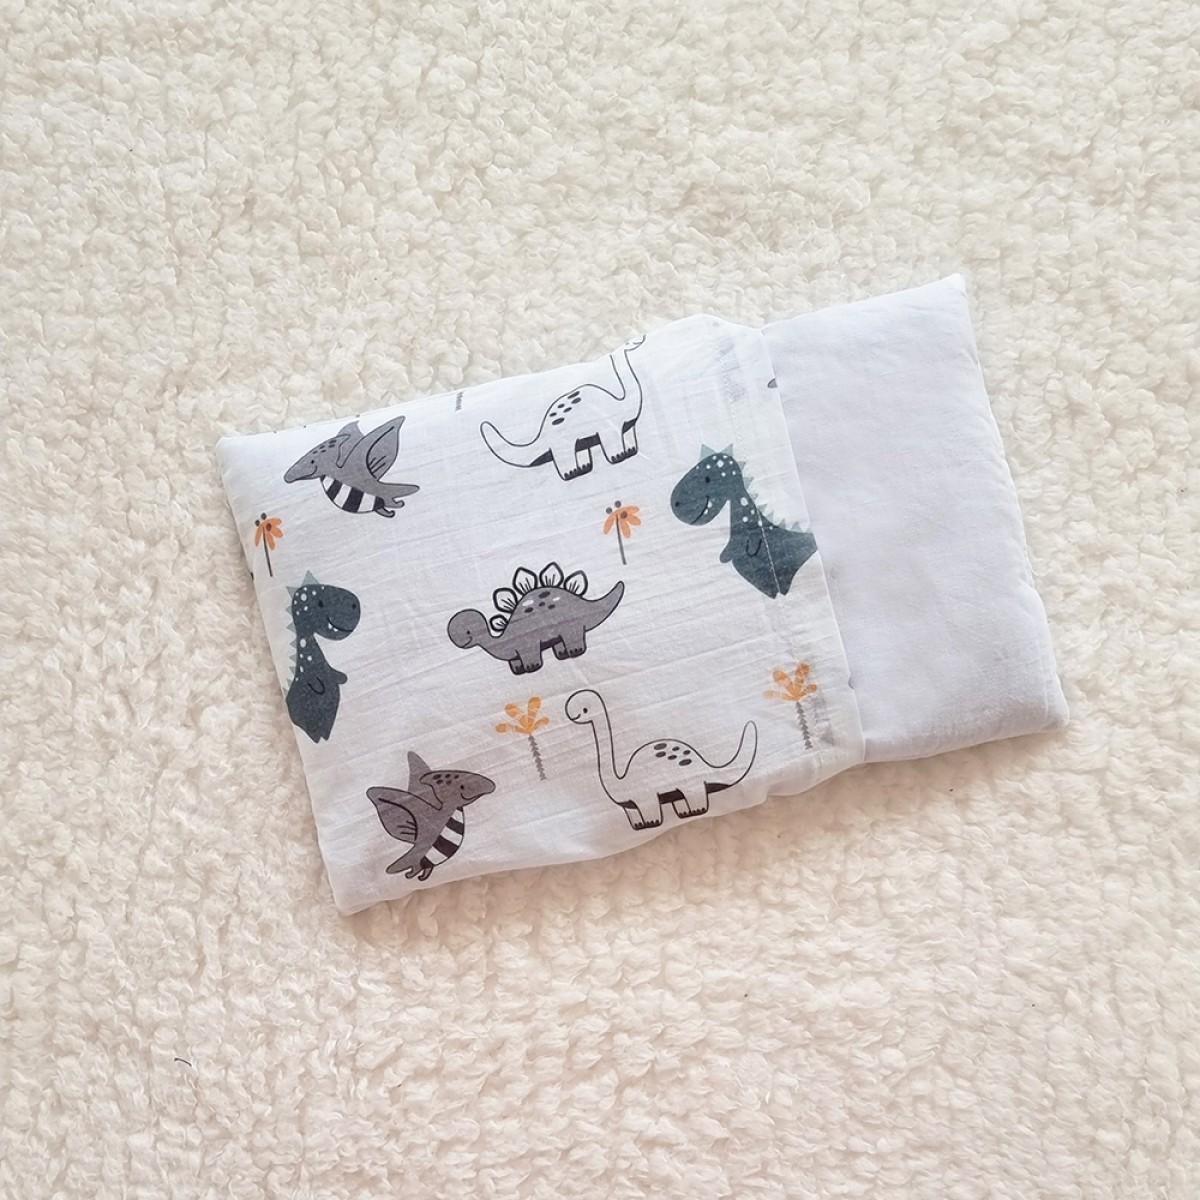 Cot Bedding Set with Rai Pillow - Dino